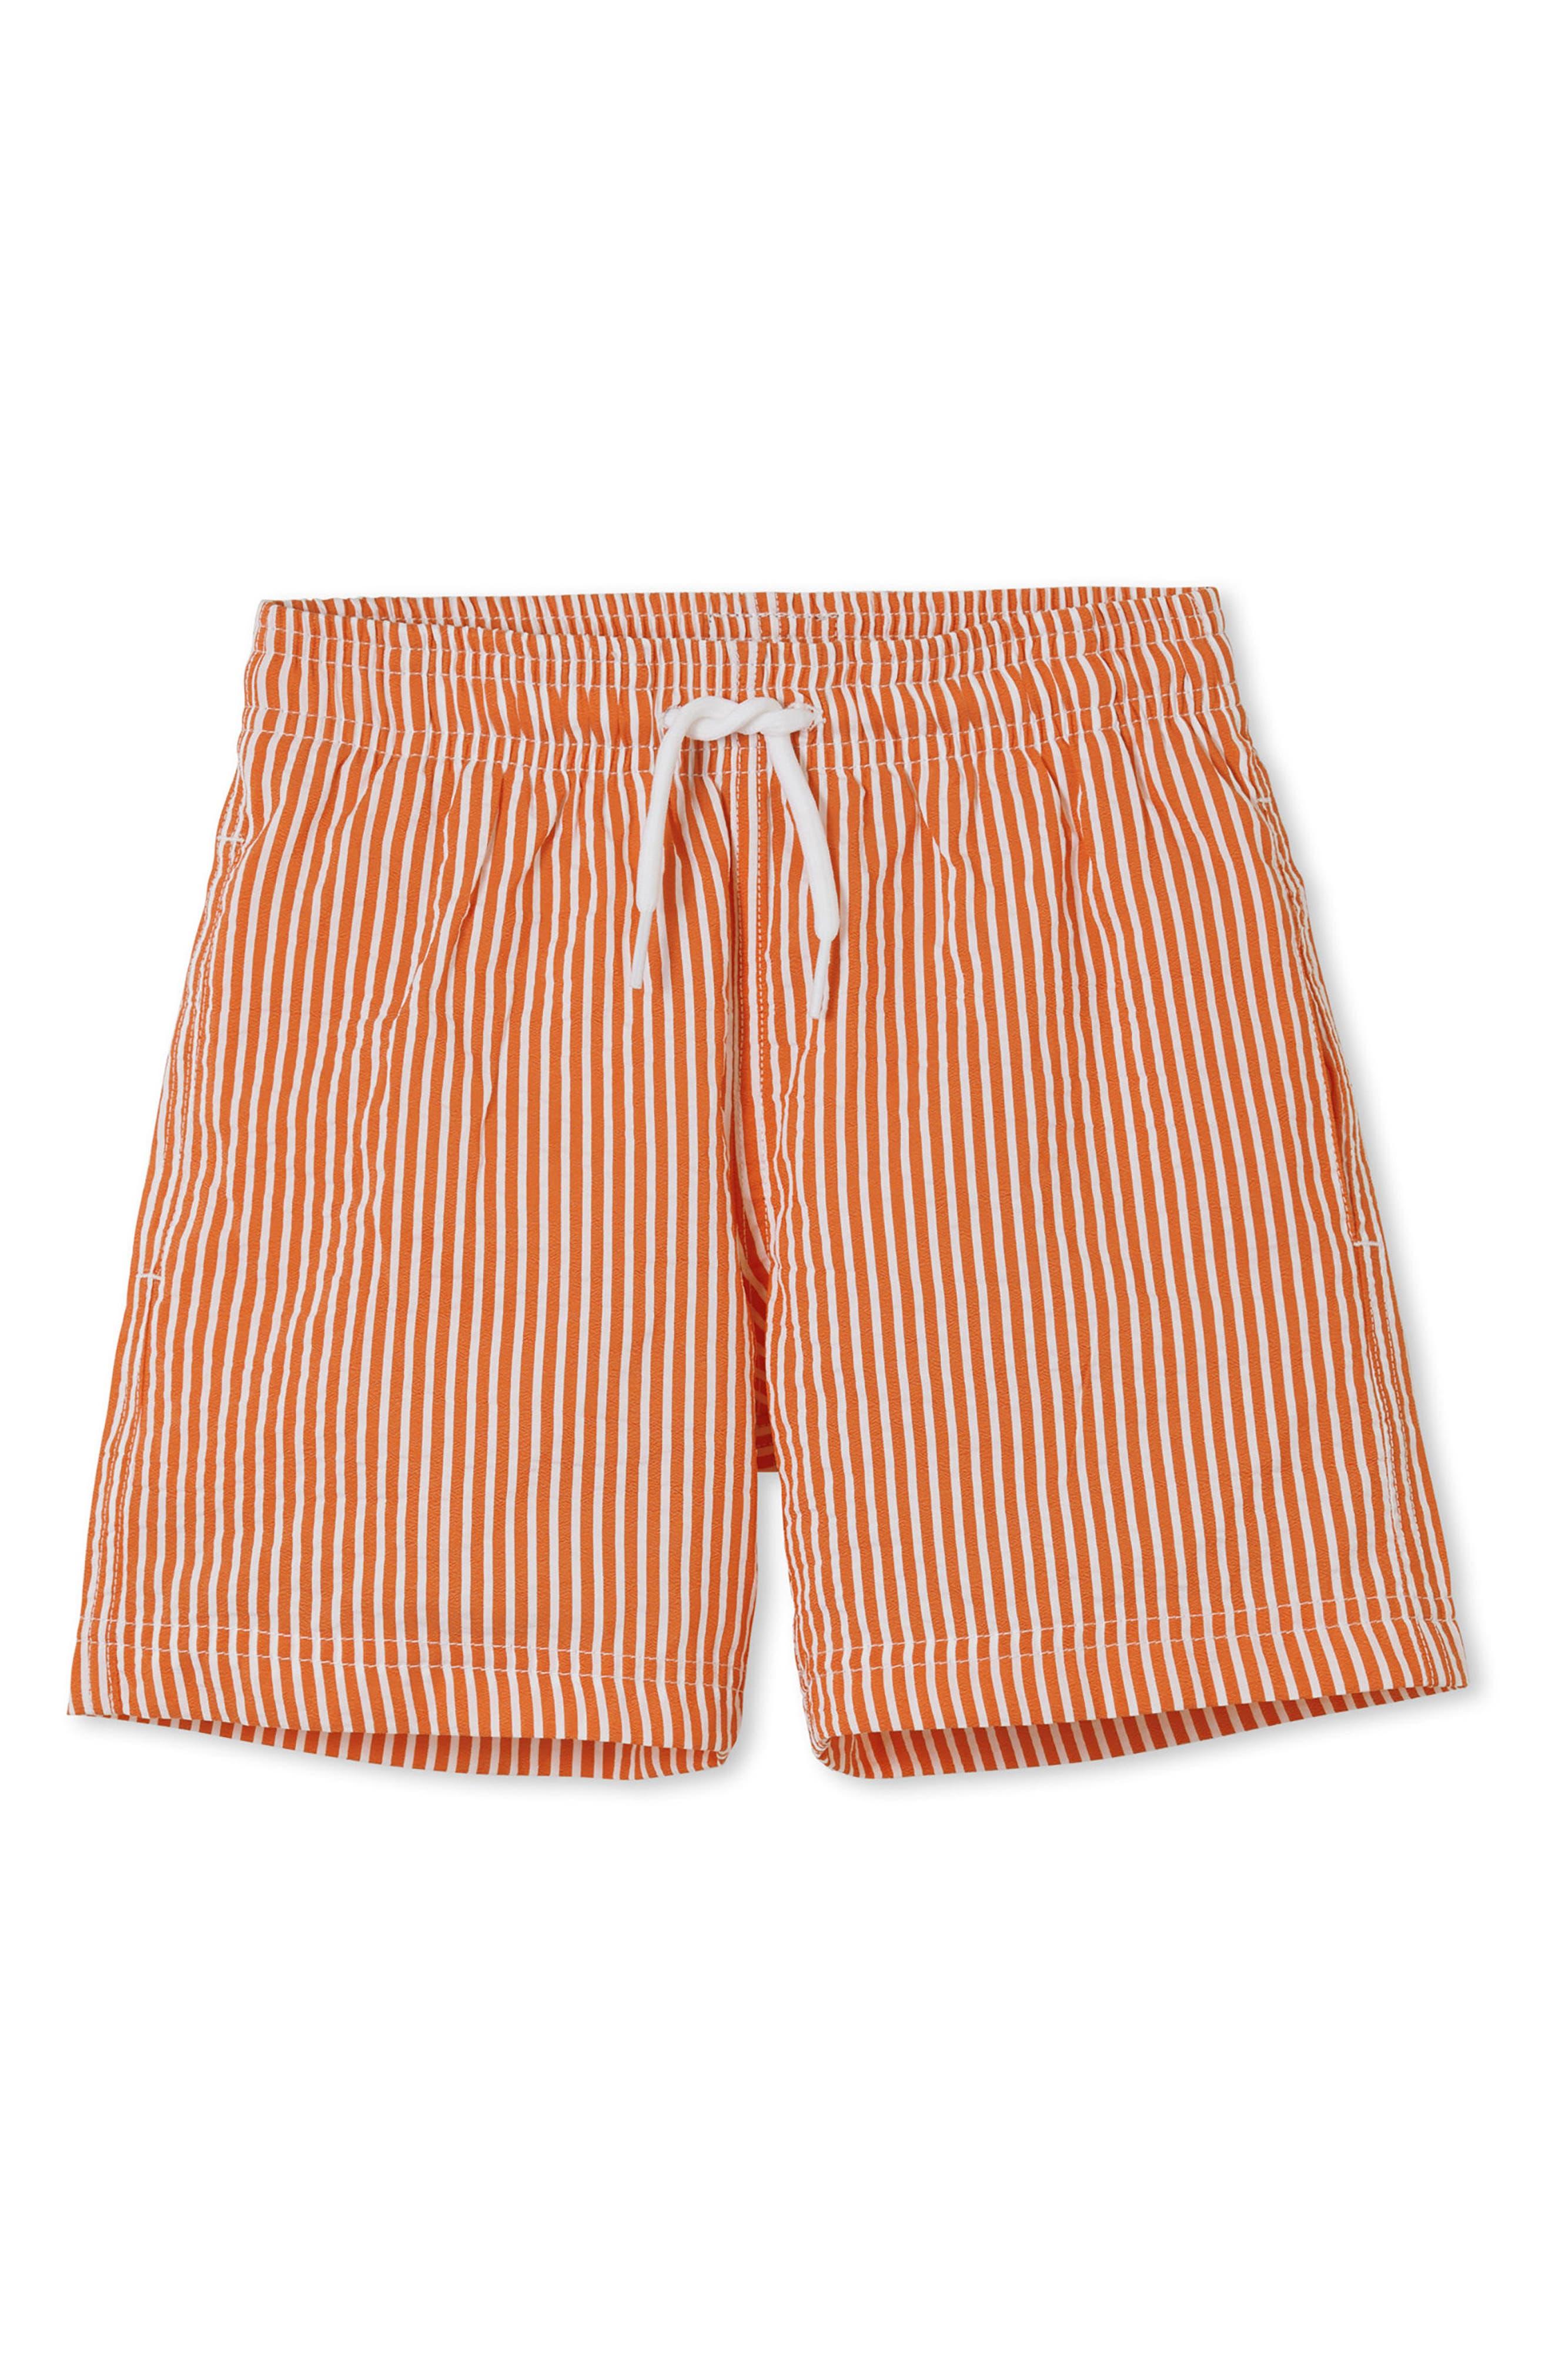 Orange Stripe Swim Trunks,                         Main,                         color, 800